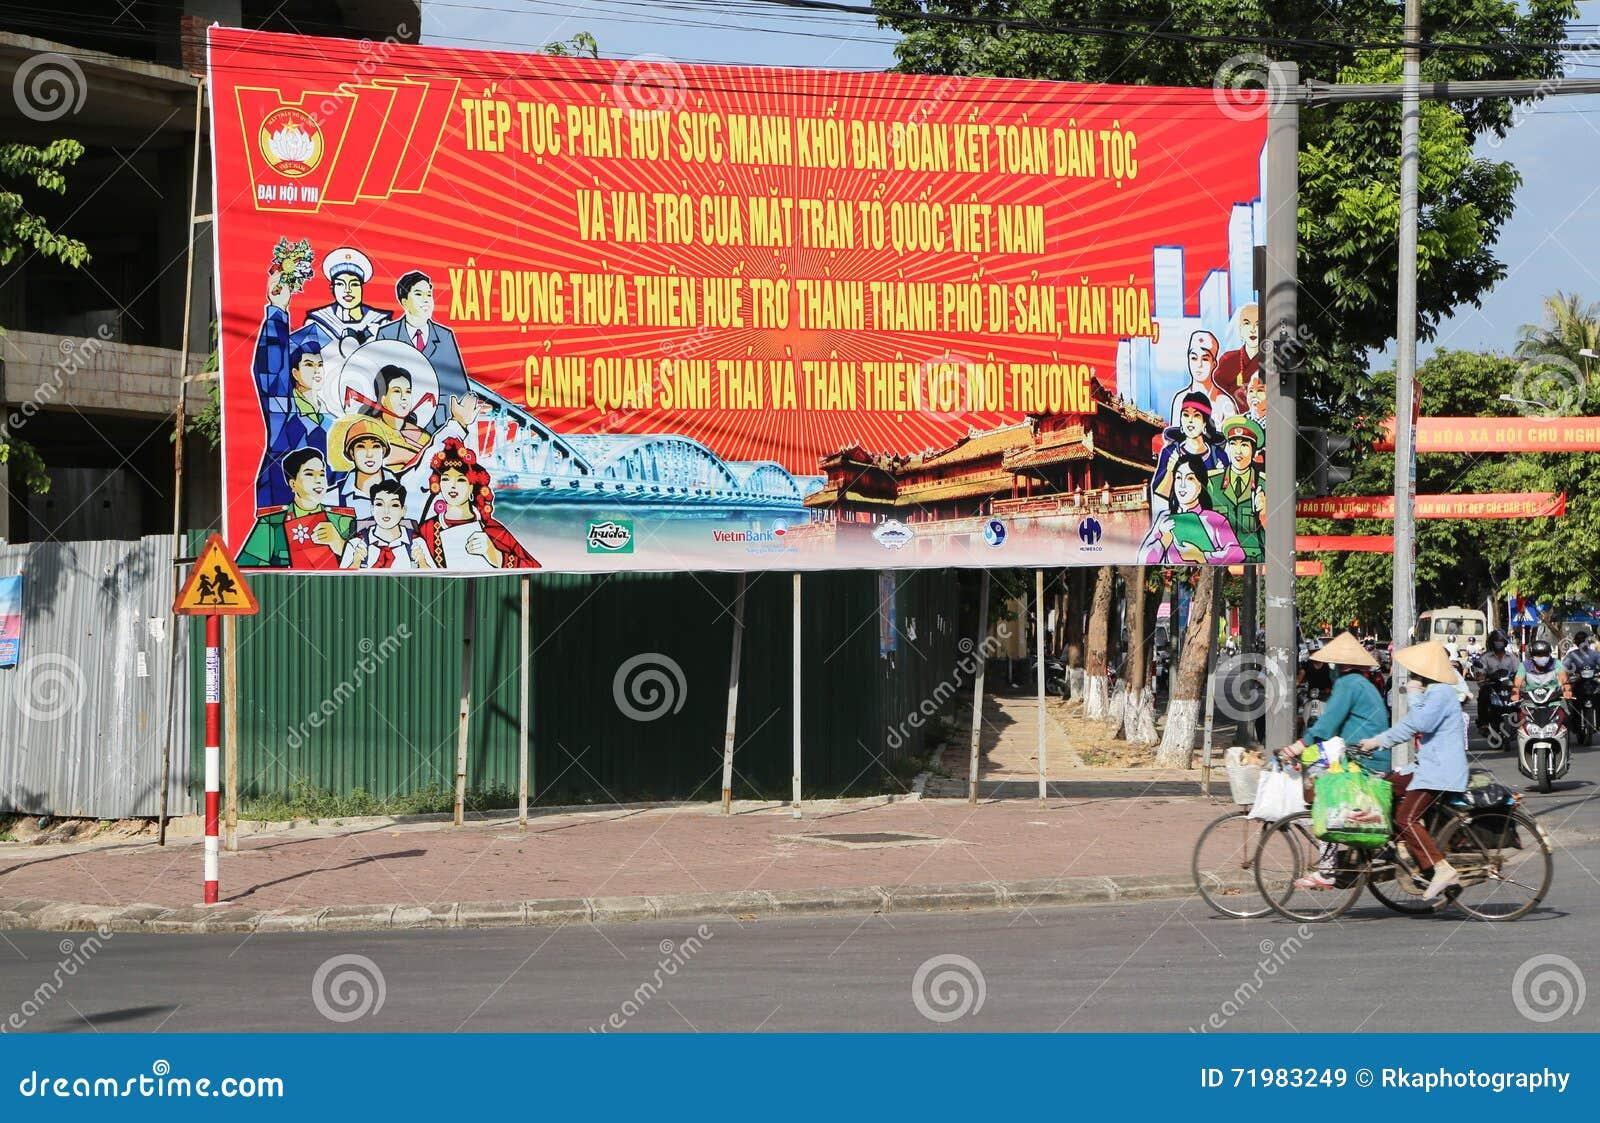 Vietnamesisches Vaterland-Frontplakat in der Farbe, Vietnam